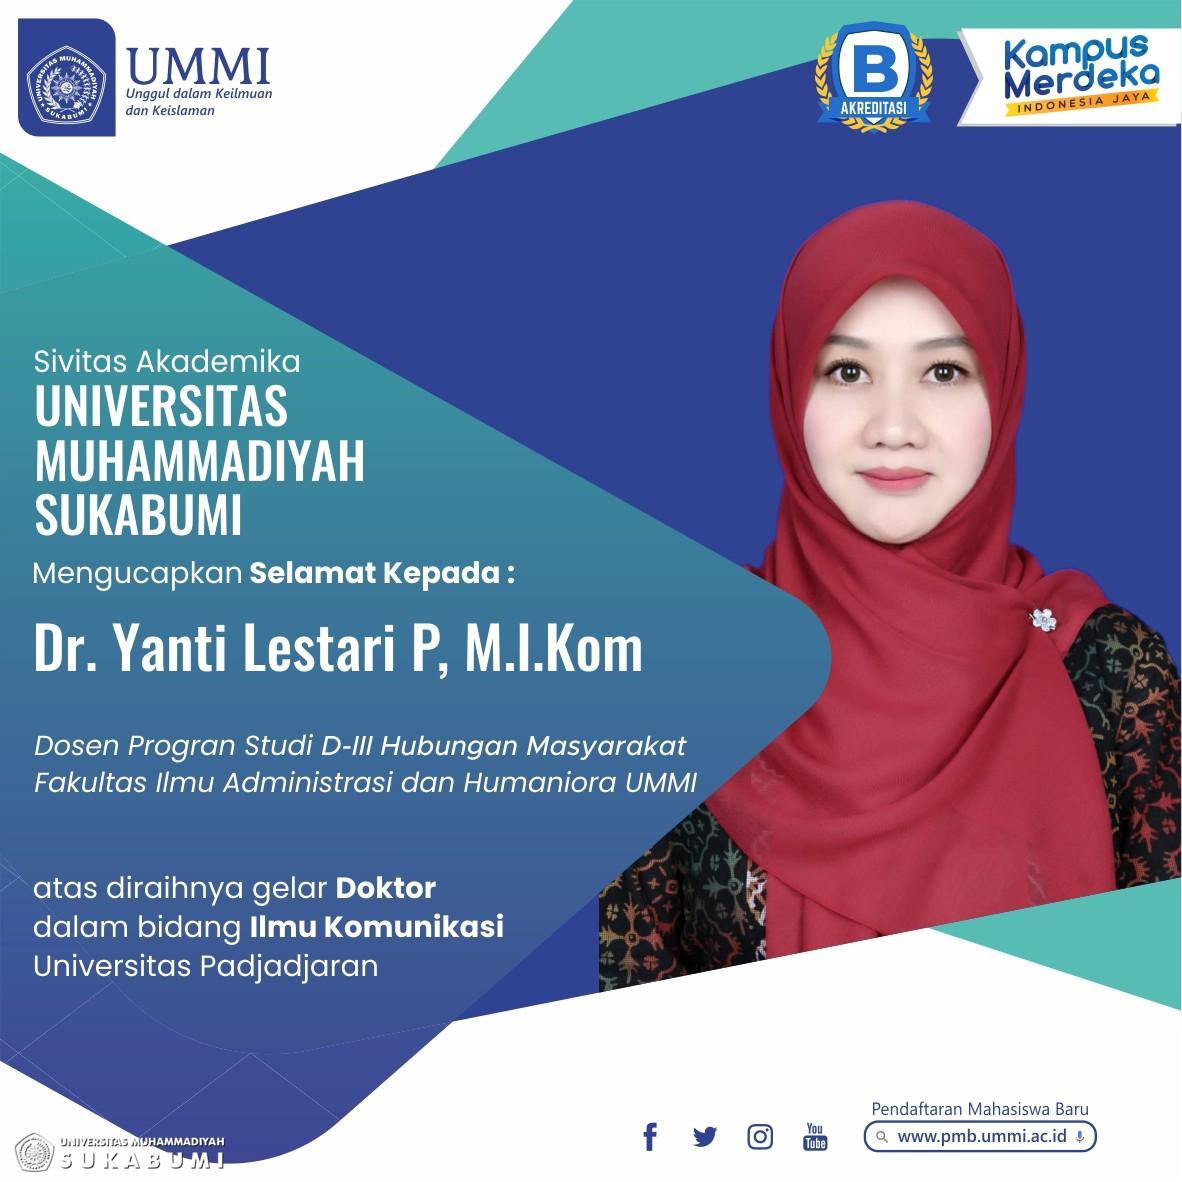 Yanti Lestari Pujiastuti, Dosen Program Studi Hubungan MasyarakatUMMI Raih Gelar Doktor